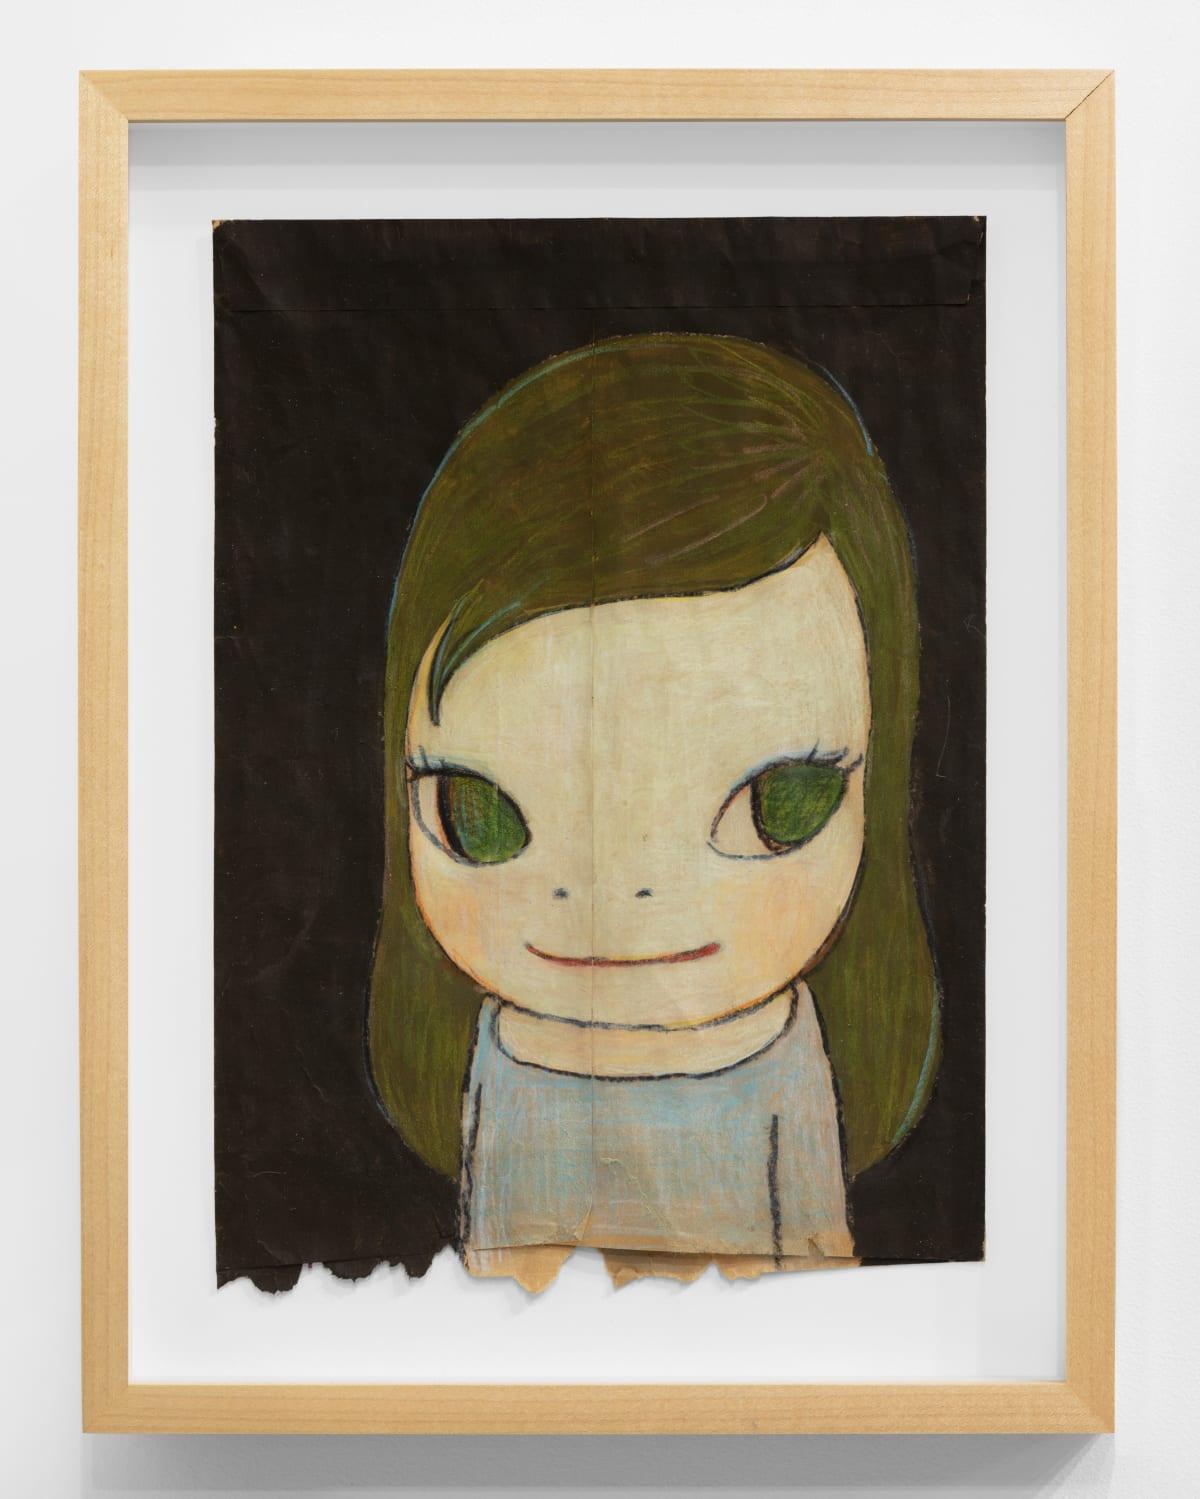 Yoshitomo Nara Untitled, 2006 Color pencil and acrylic on envelope 10 7/8 x 7 3/4 in (27.6 x 17.8 cm) © YOSHITOMO NARA